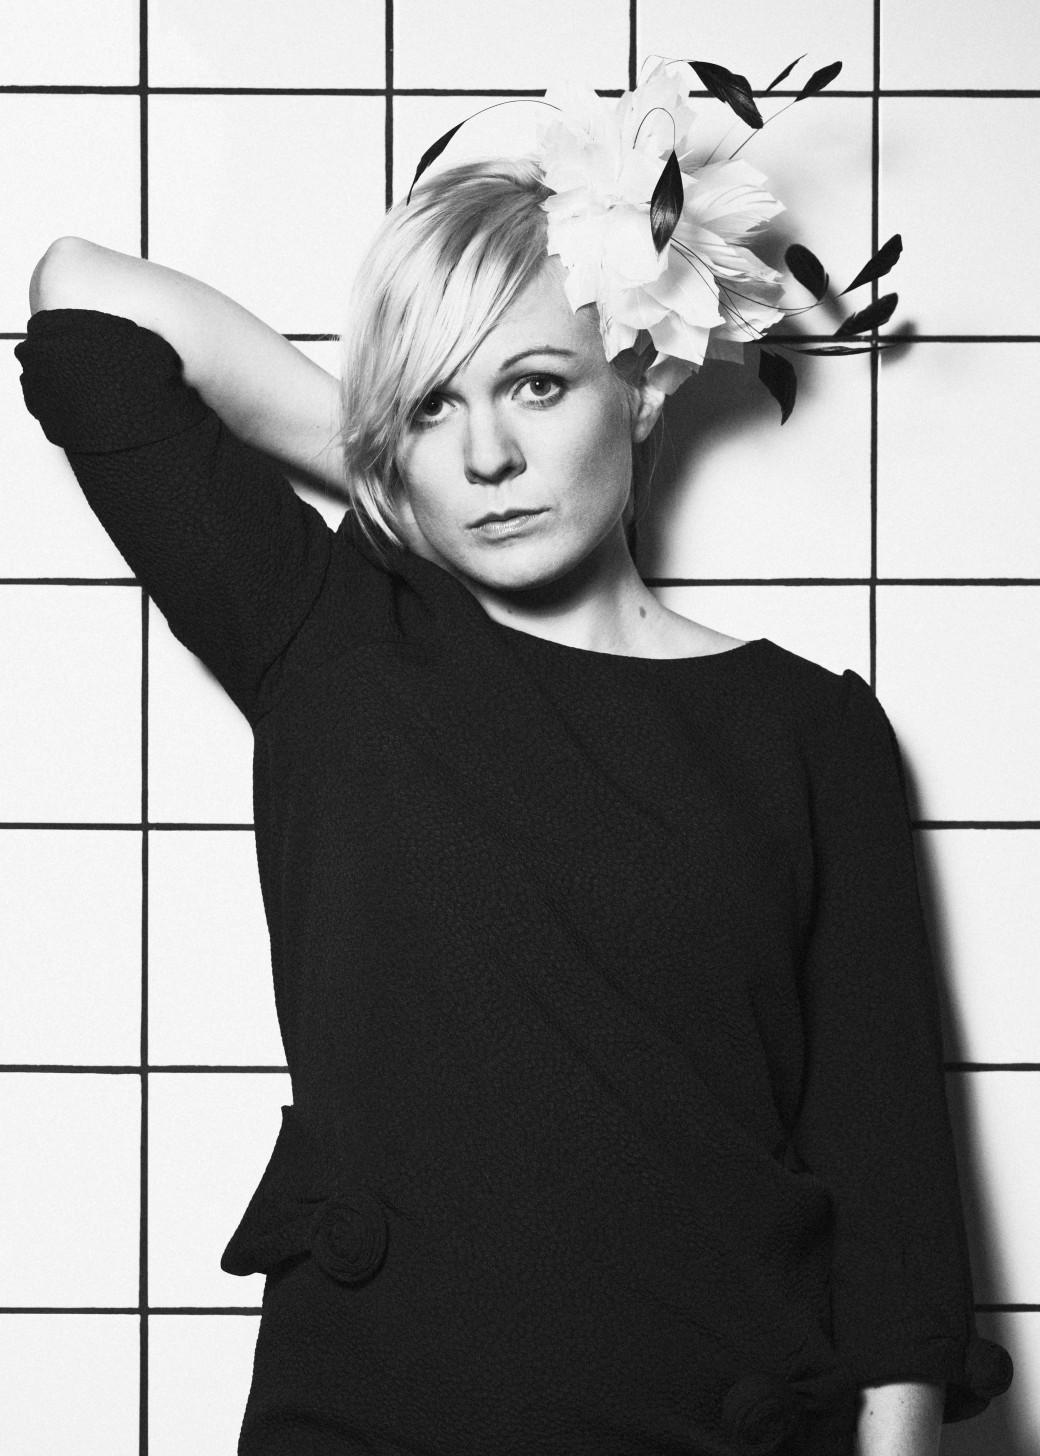 josefine-lindstrand-fotograf-miki-anagrius-lo